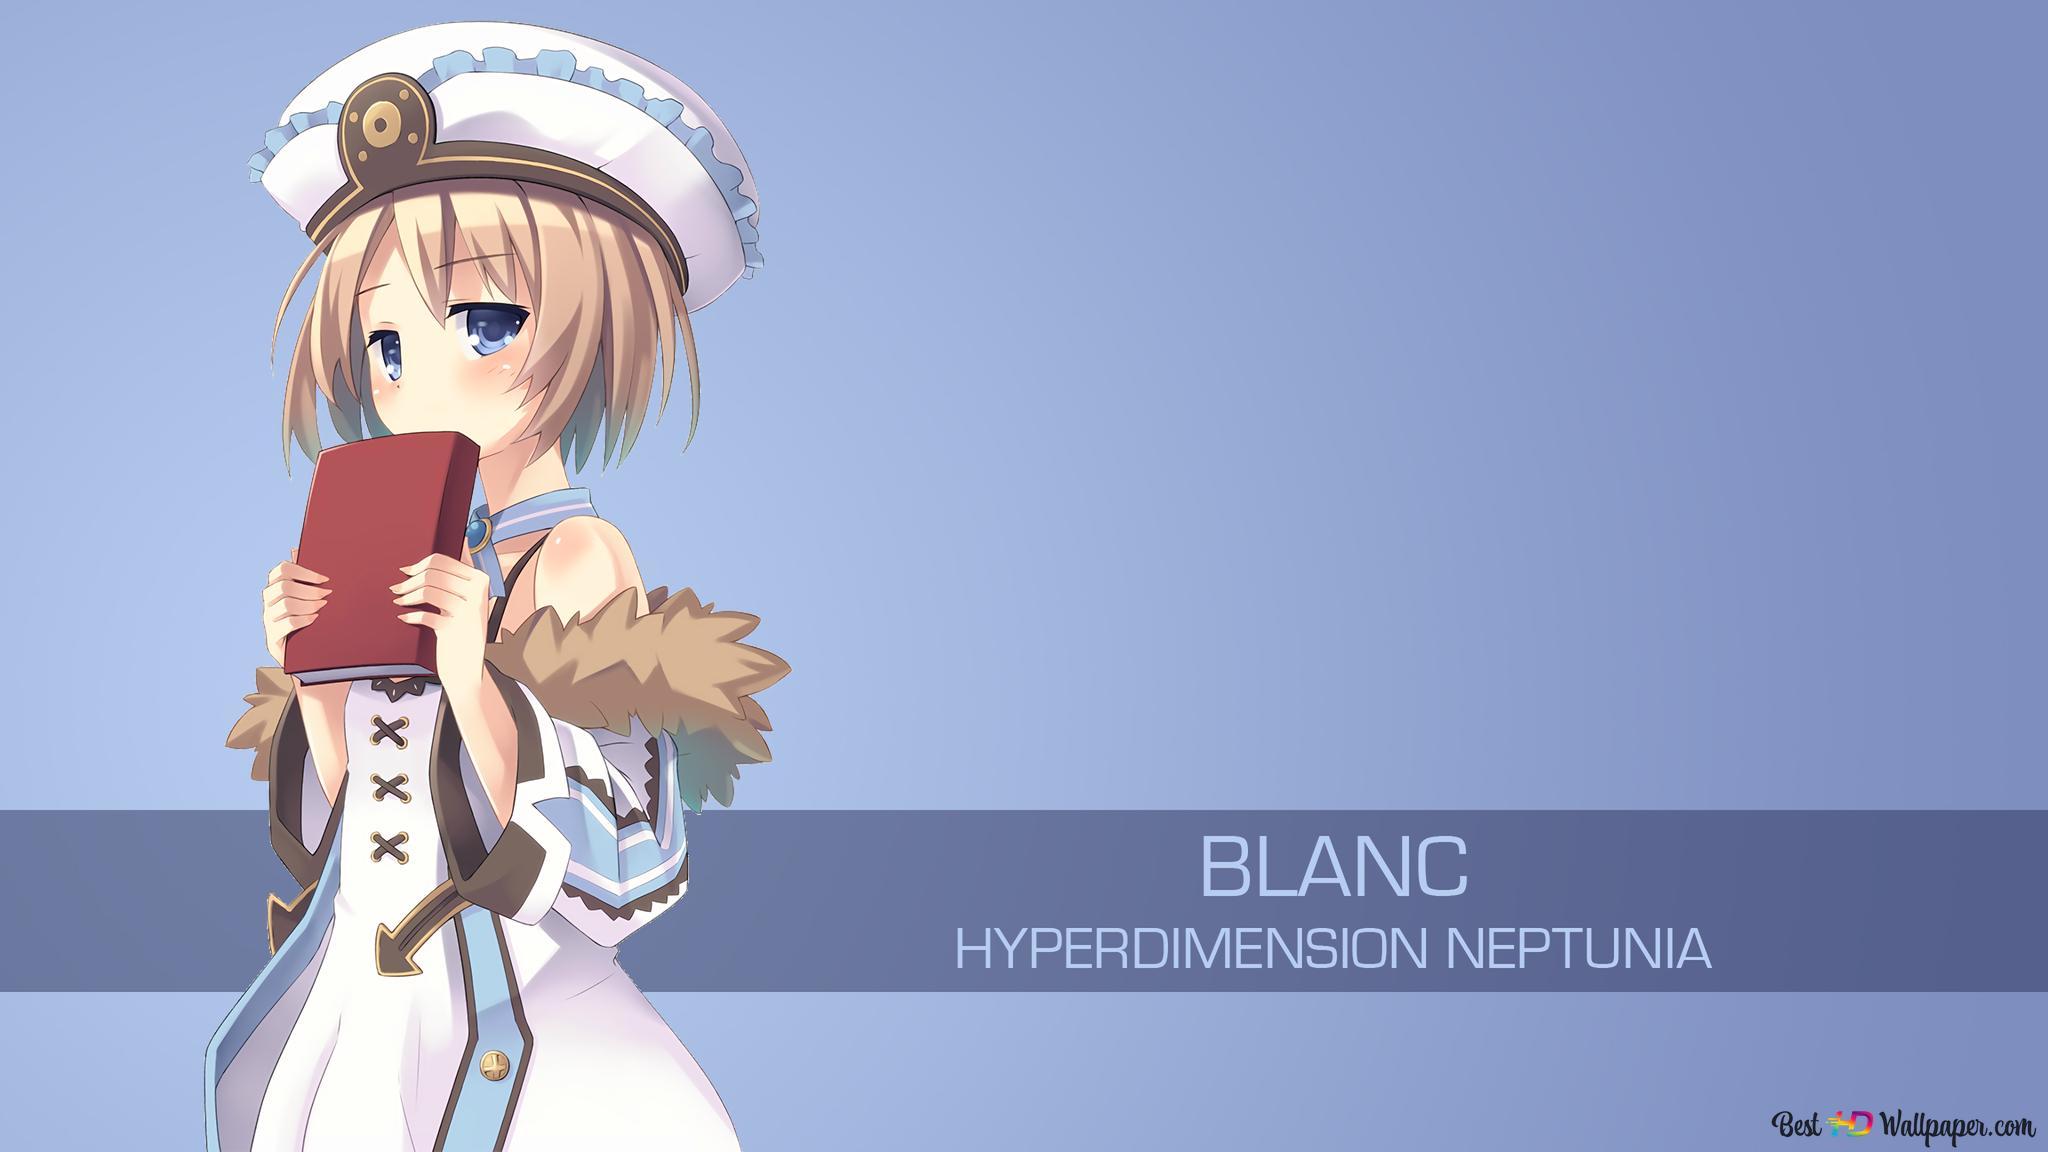 Blanc Of Hyperdimension Neptunia Hd Wallpaper Download